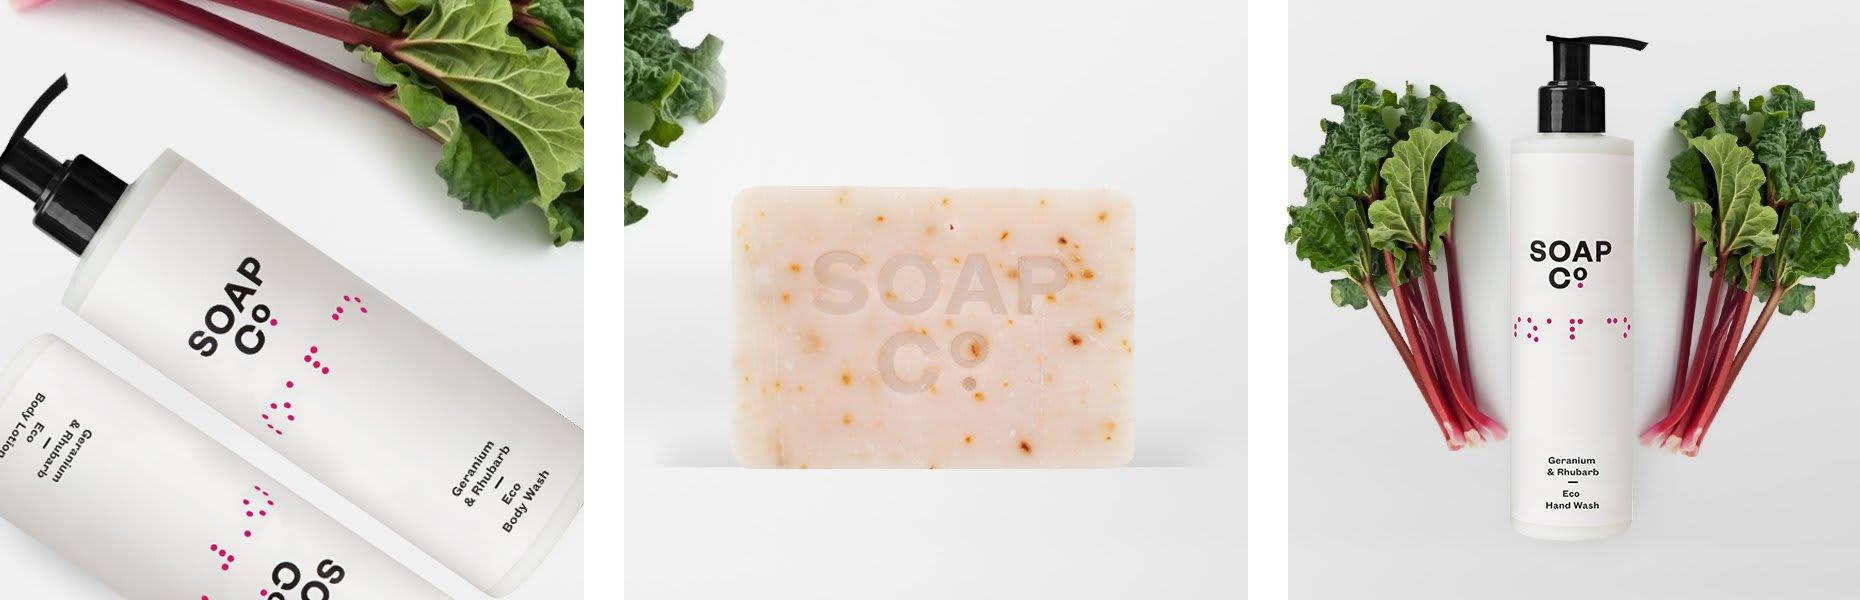 The Soap Co Geranium & Rhubarb Hand Wash